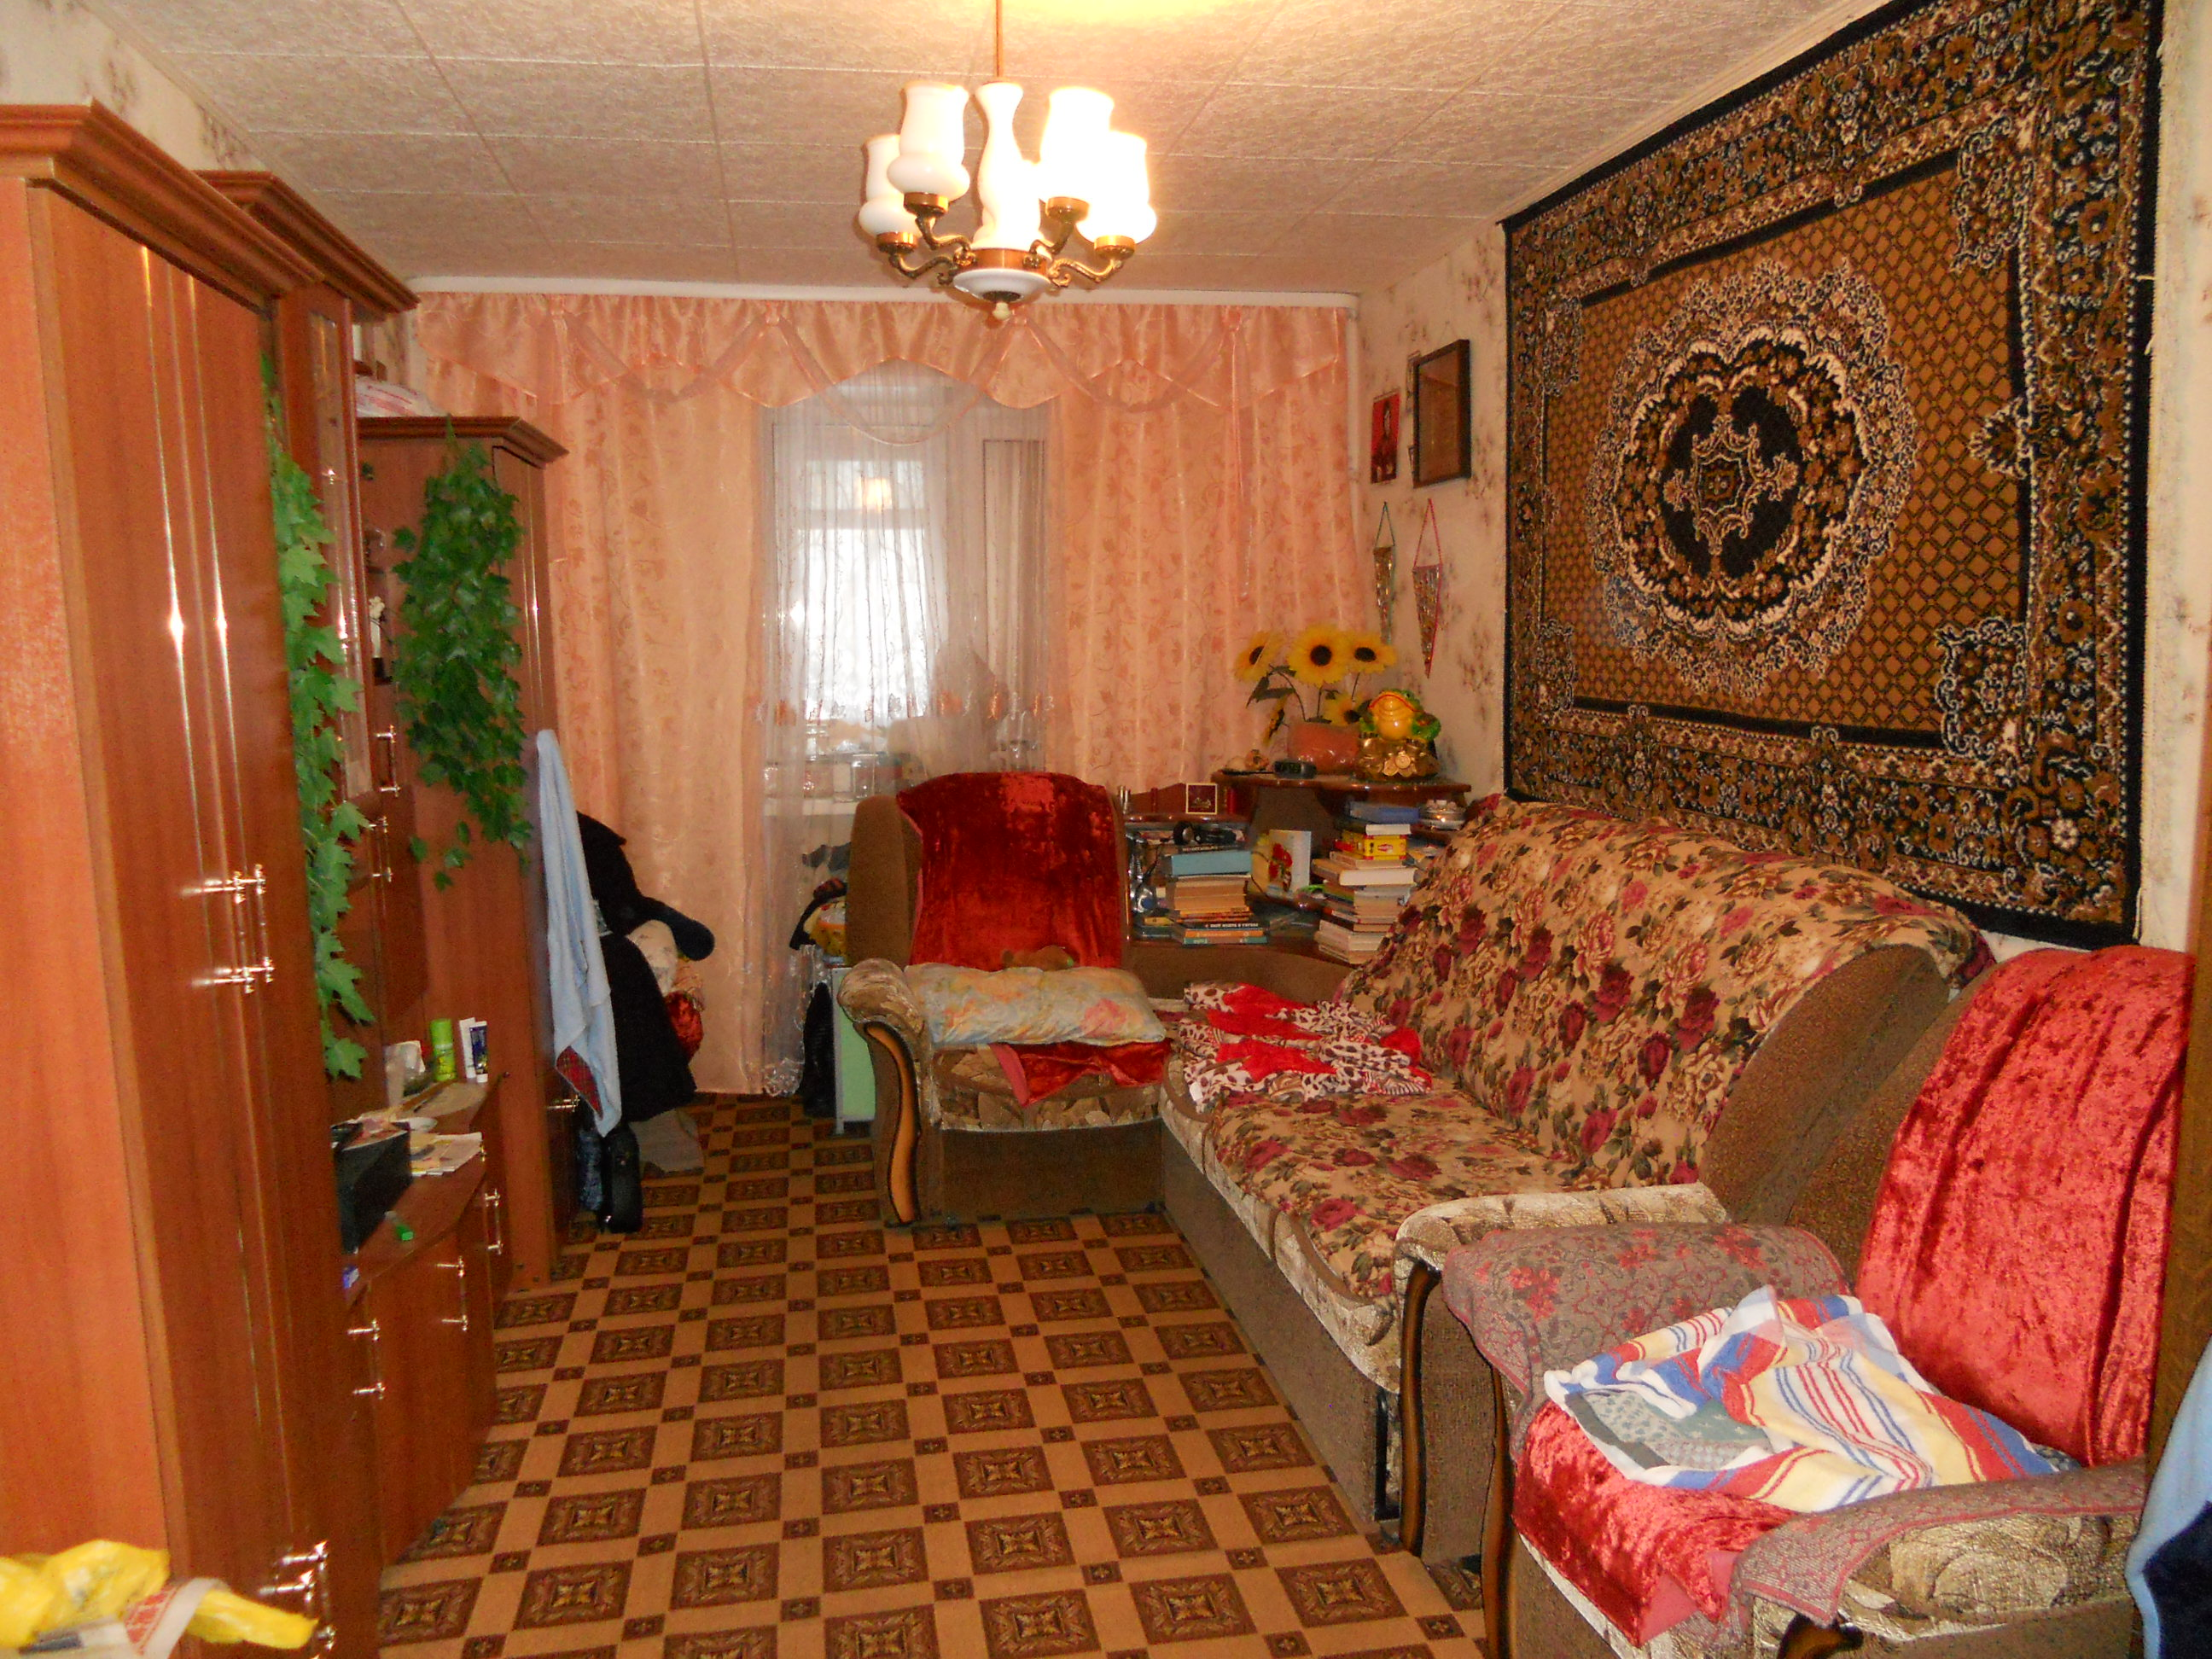 продается квартира на ул.Кольцевая, д.166/1